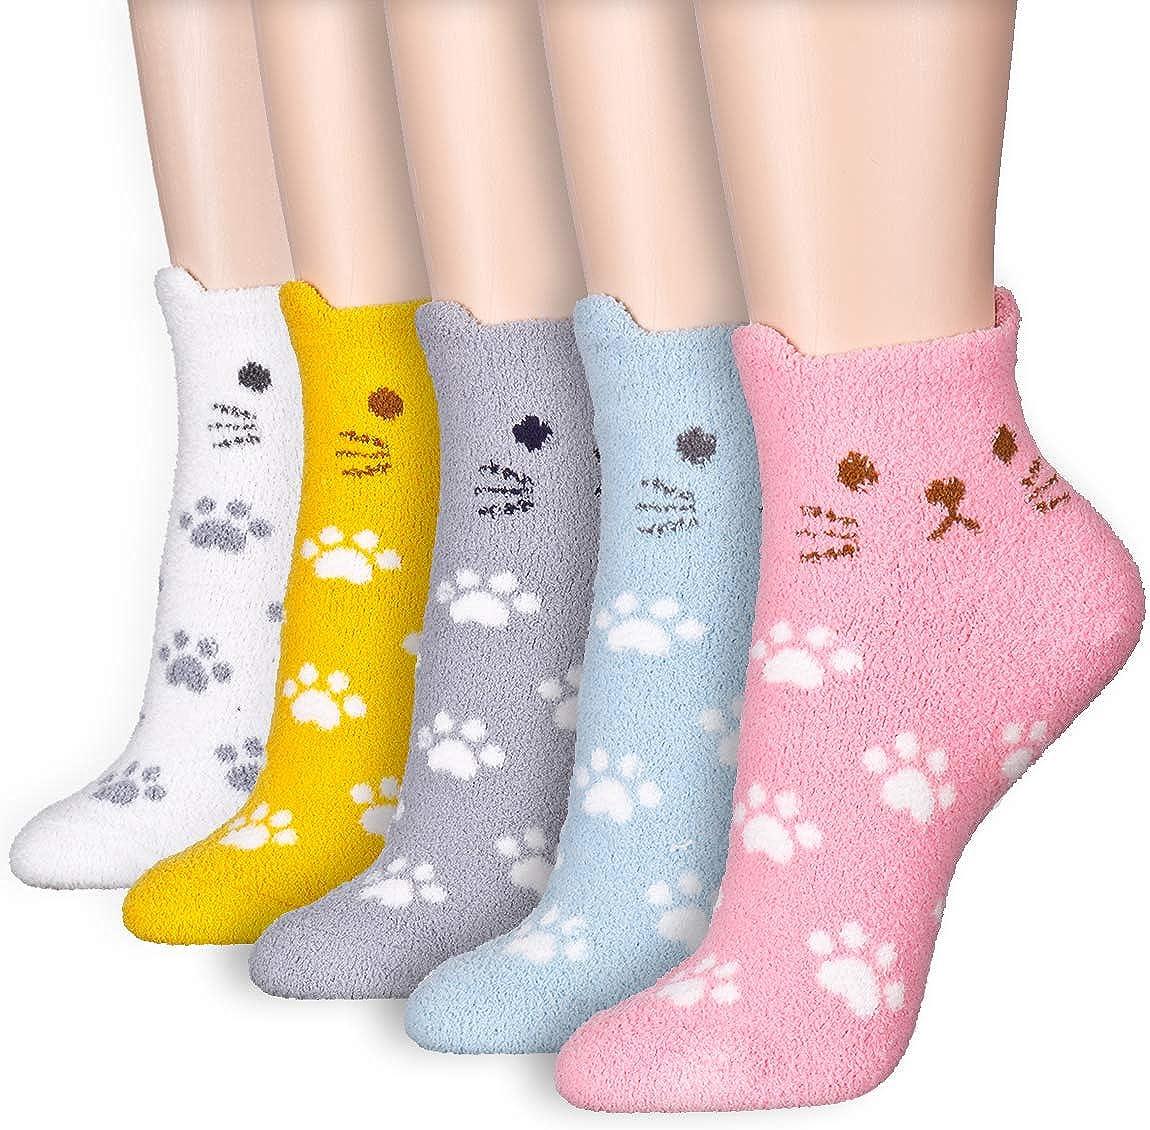 Dani's Choice Winter Warm Thick Knit Cozy Fuzzy Micro Crew Ankle Sneaker Socks